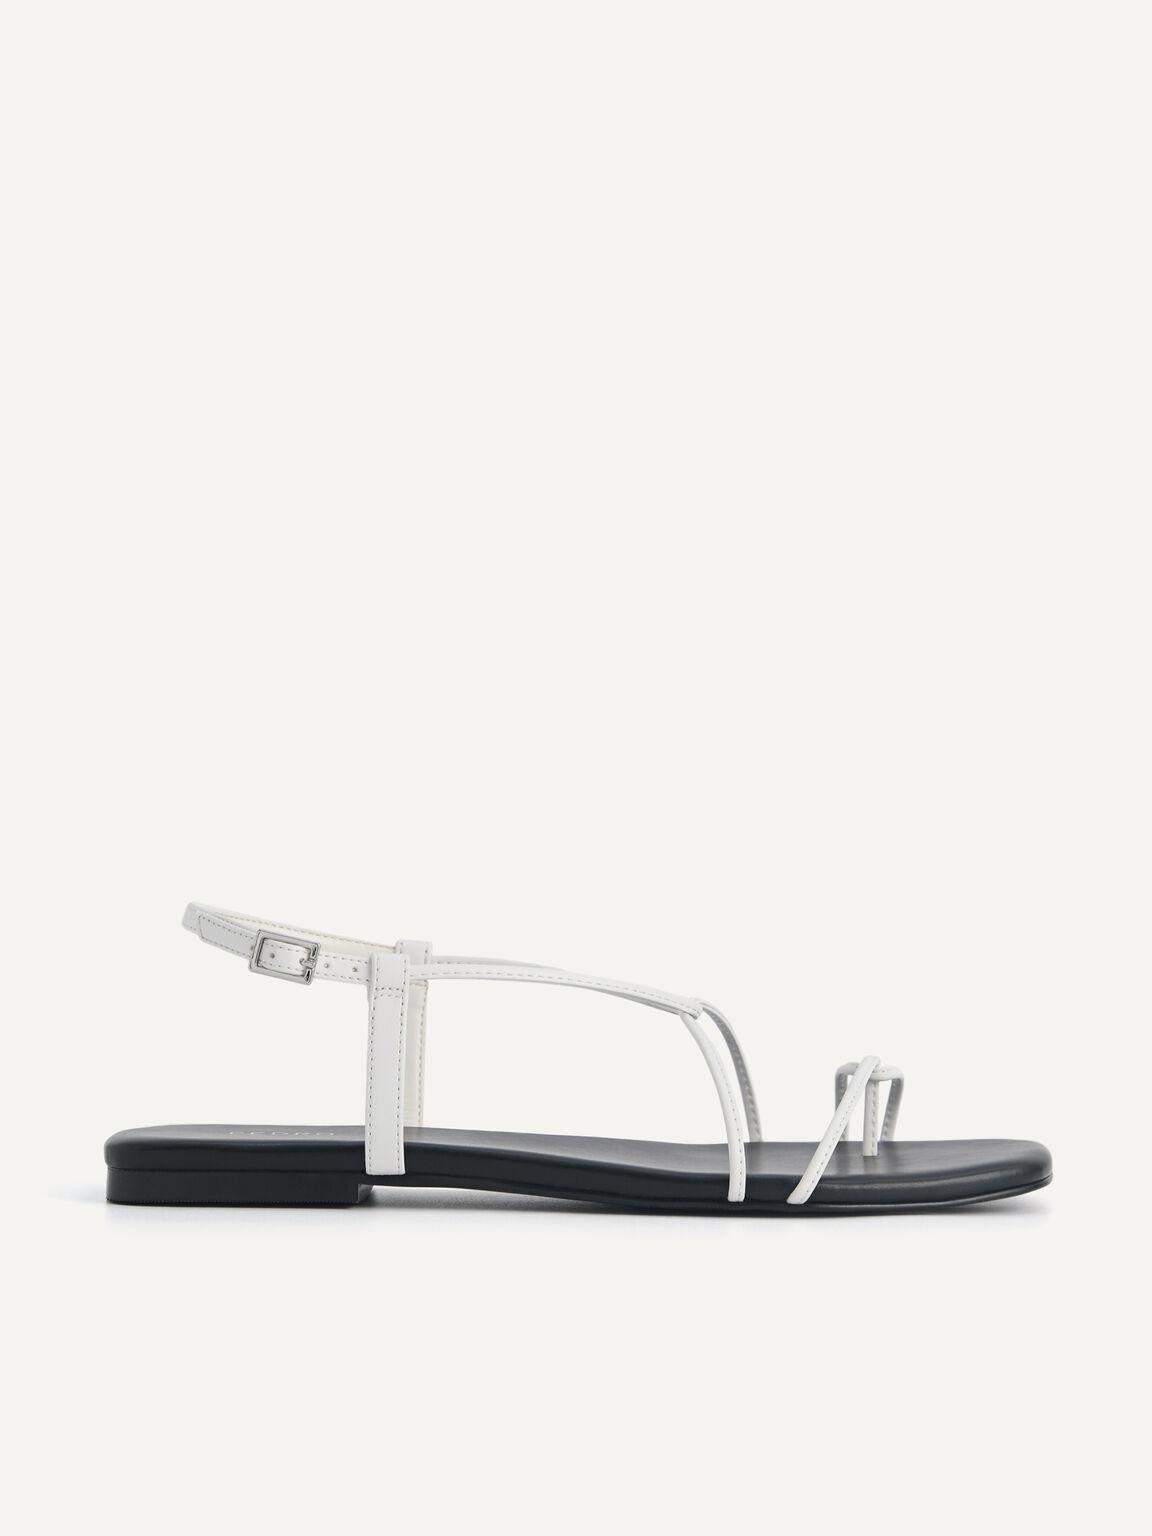 Criss Cross Toe Loop Sandals, White, hi-res